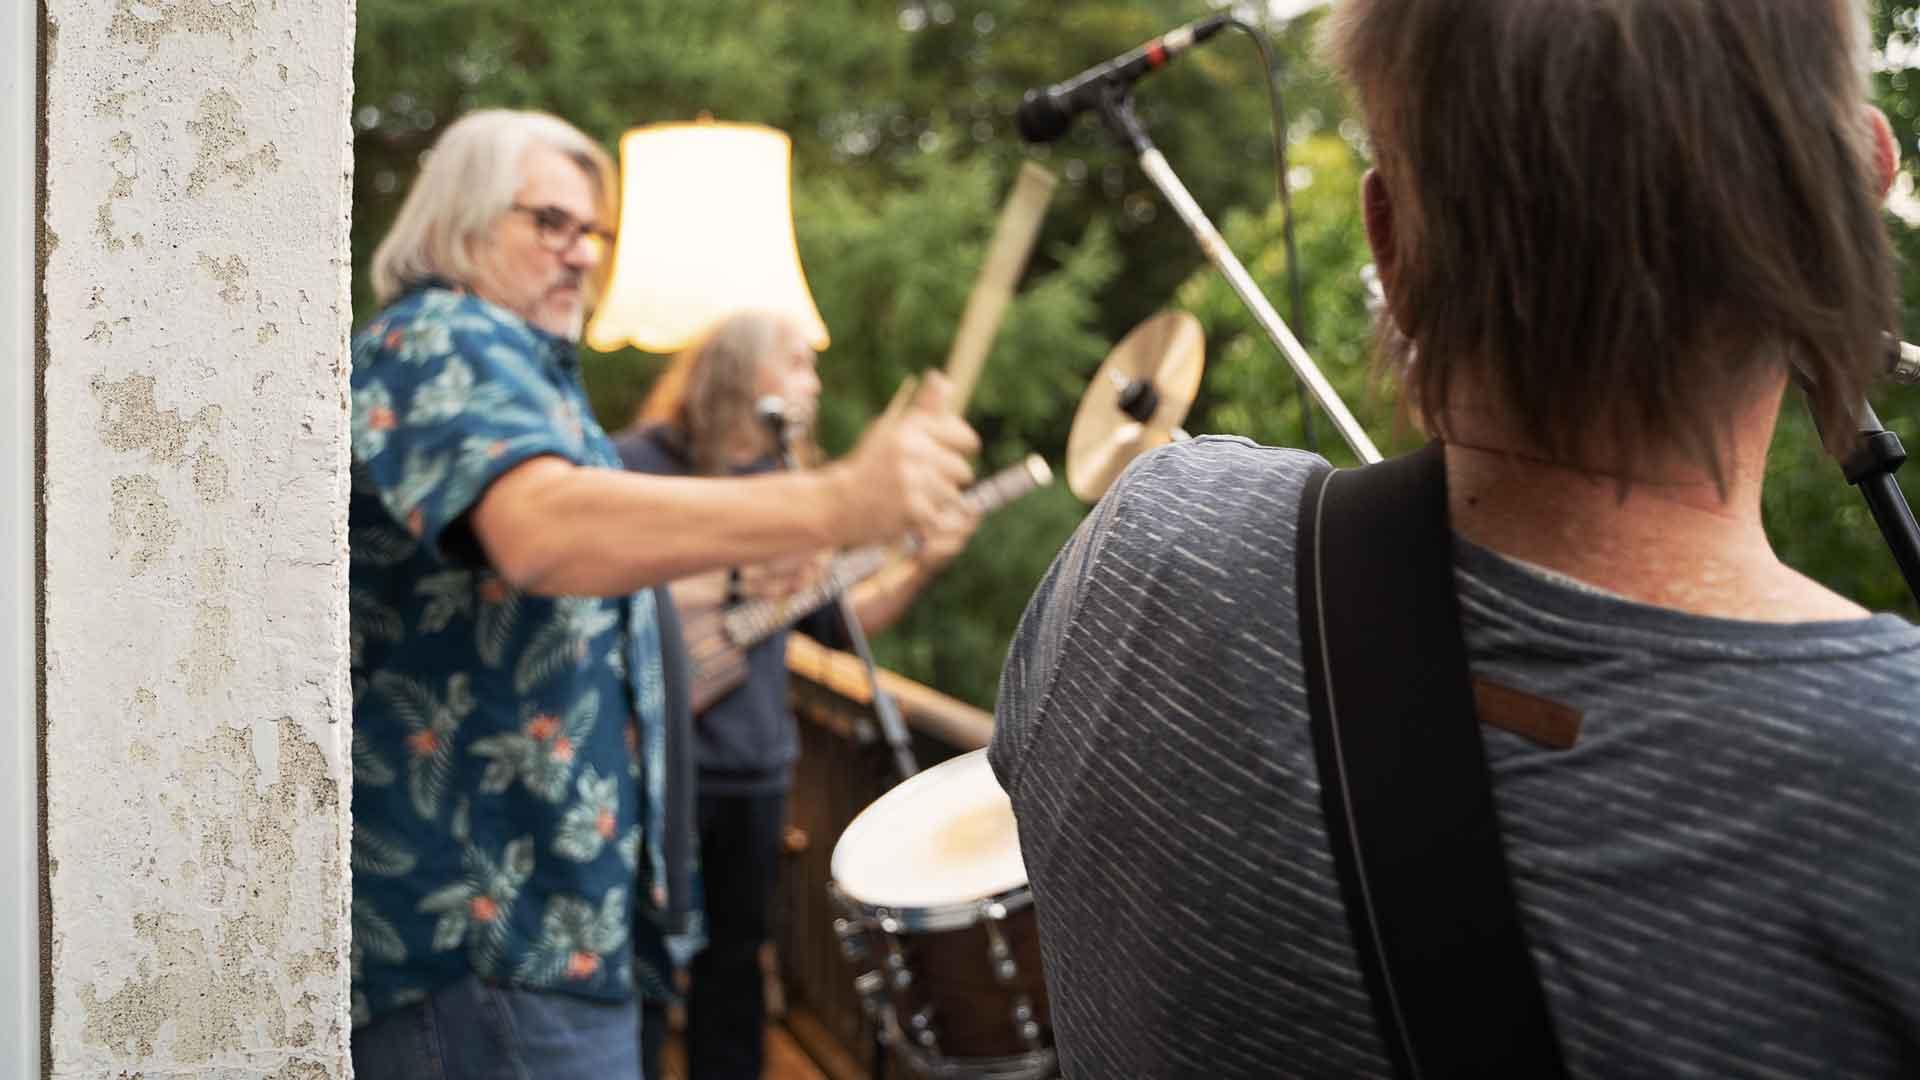 De Utschuss rockt beim Balkon der freien Künste 2020